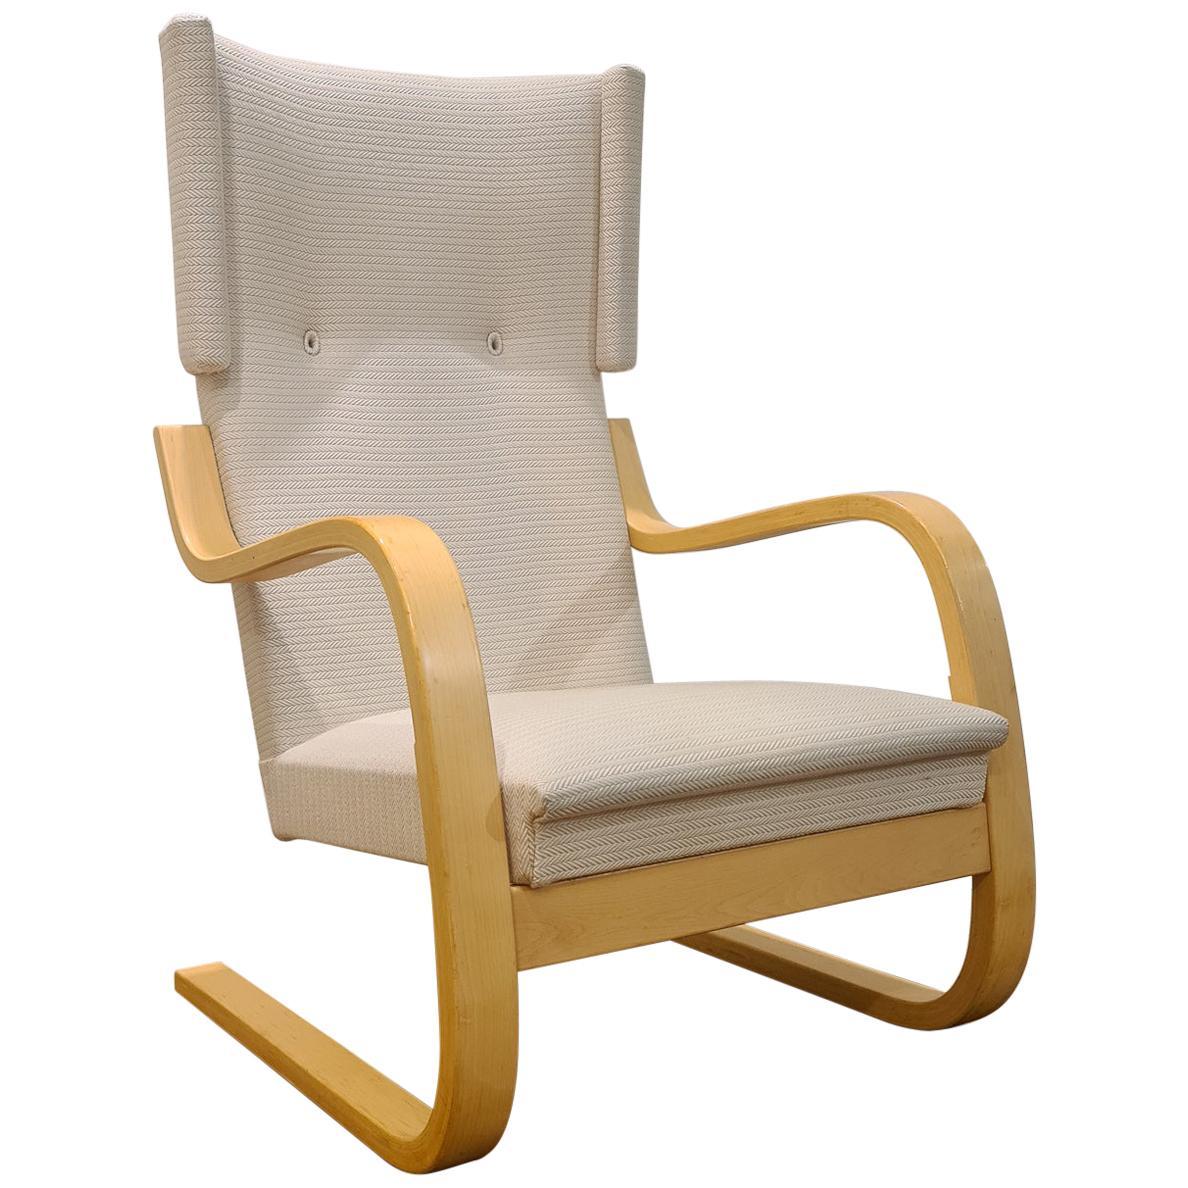 Alvar Aalto 401 Wingback Chair Artek, Finland, 1970